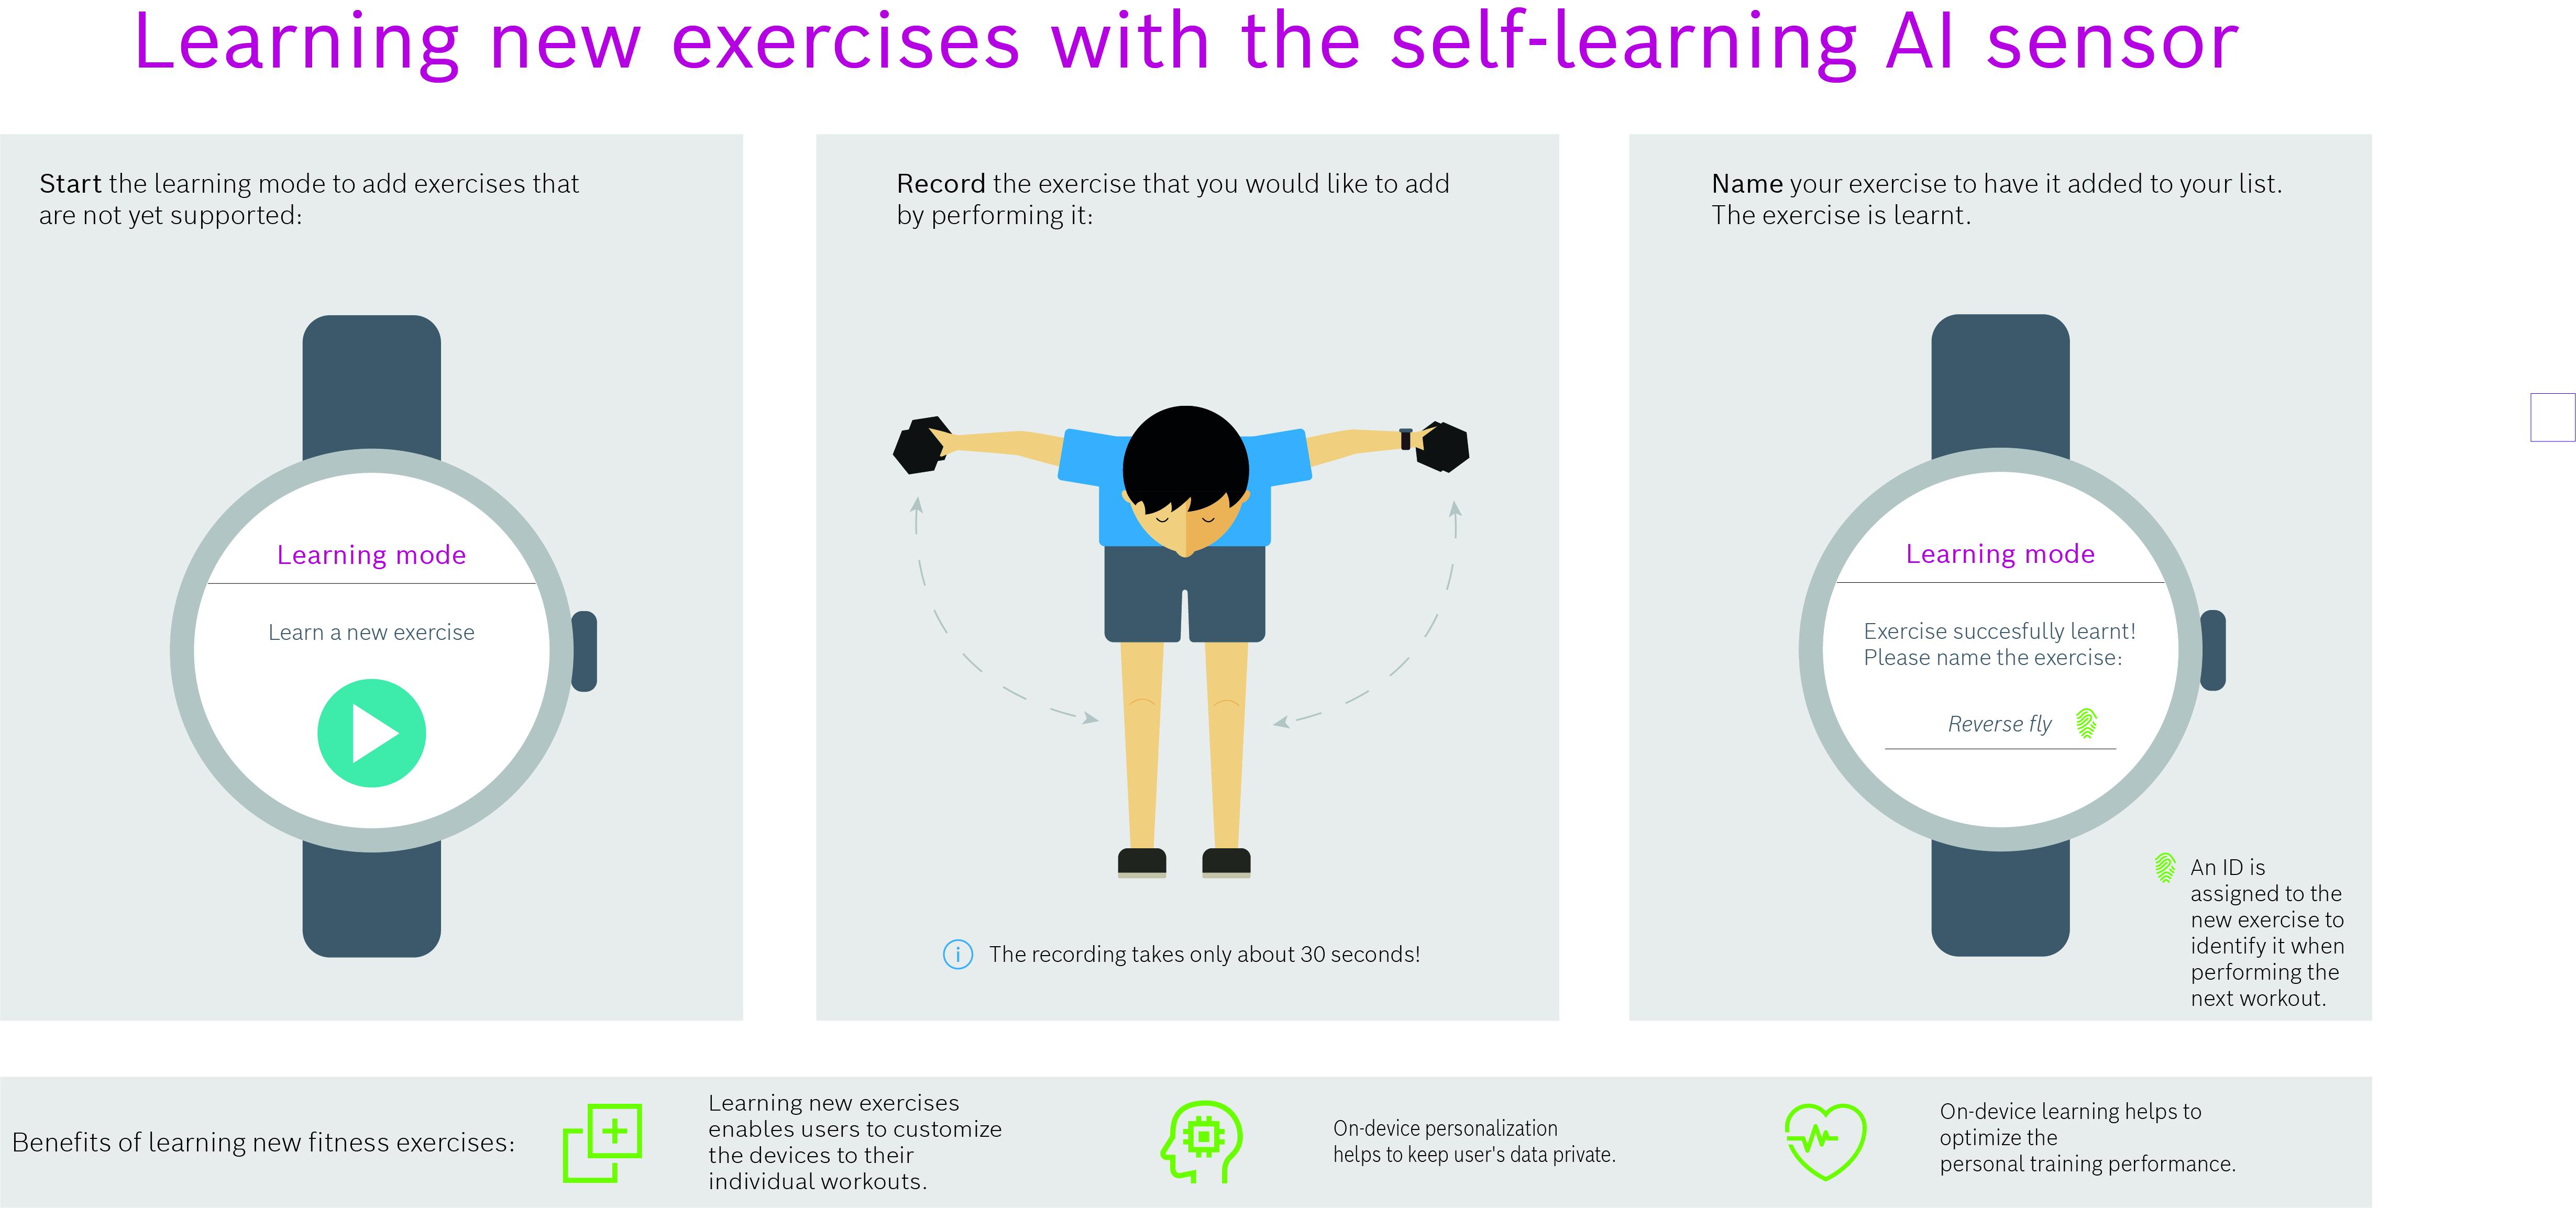 Sensors get clever: AI revolutionizes fitness tracking